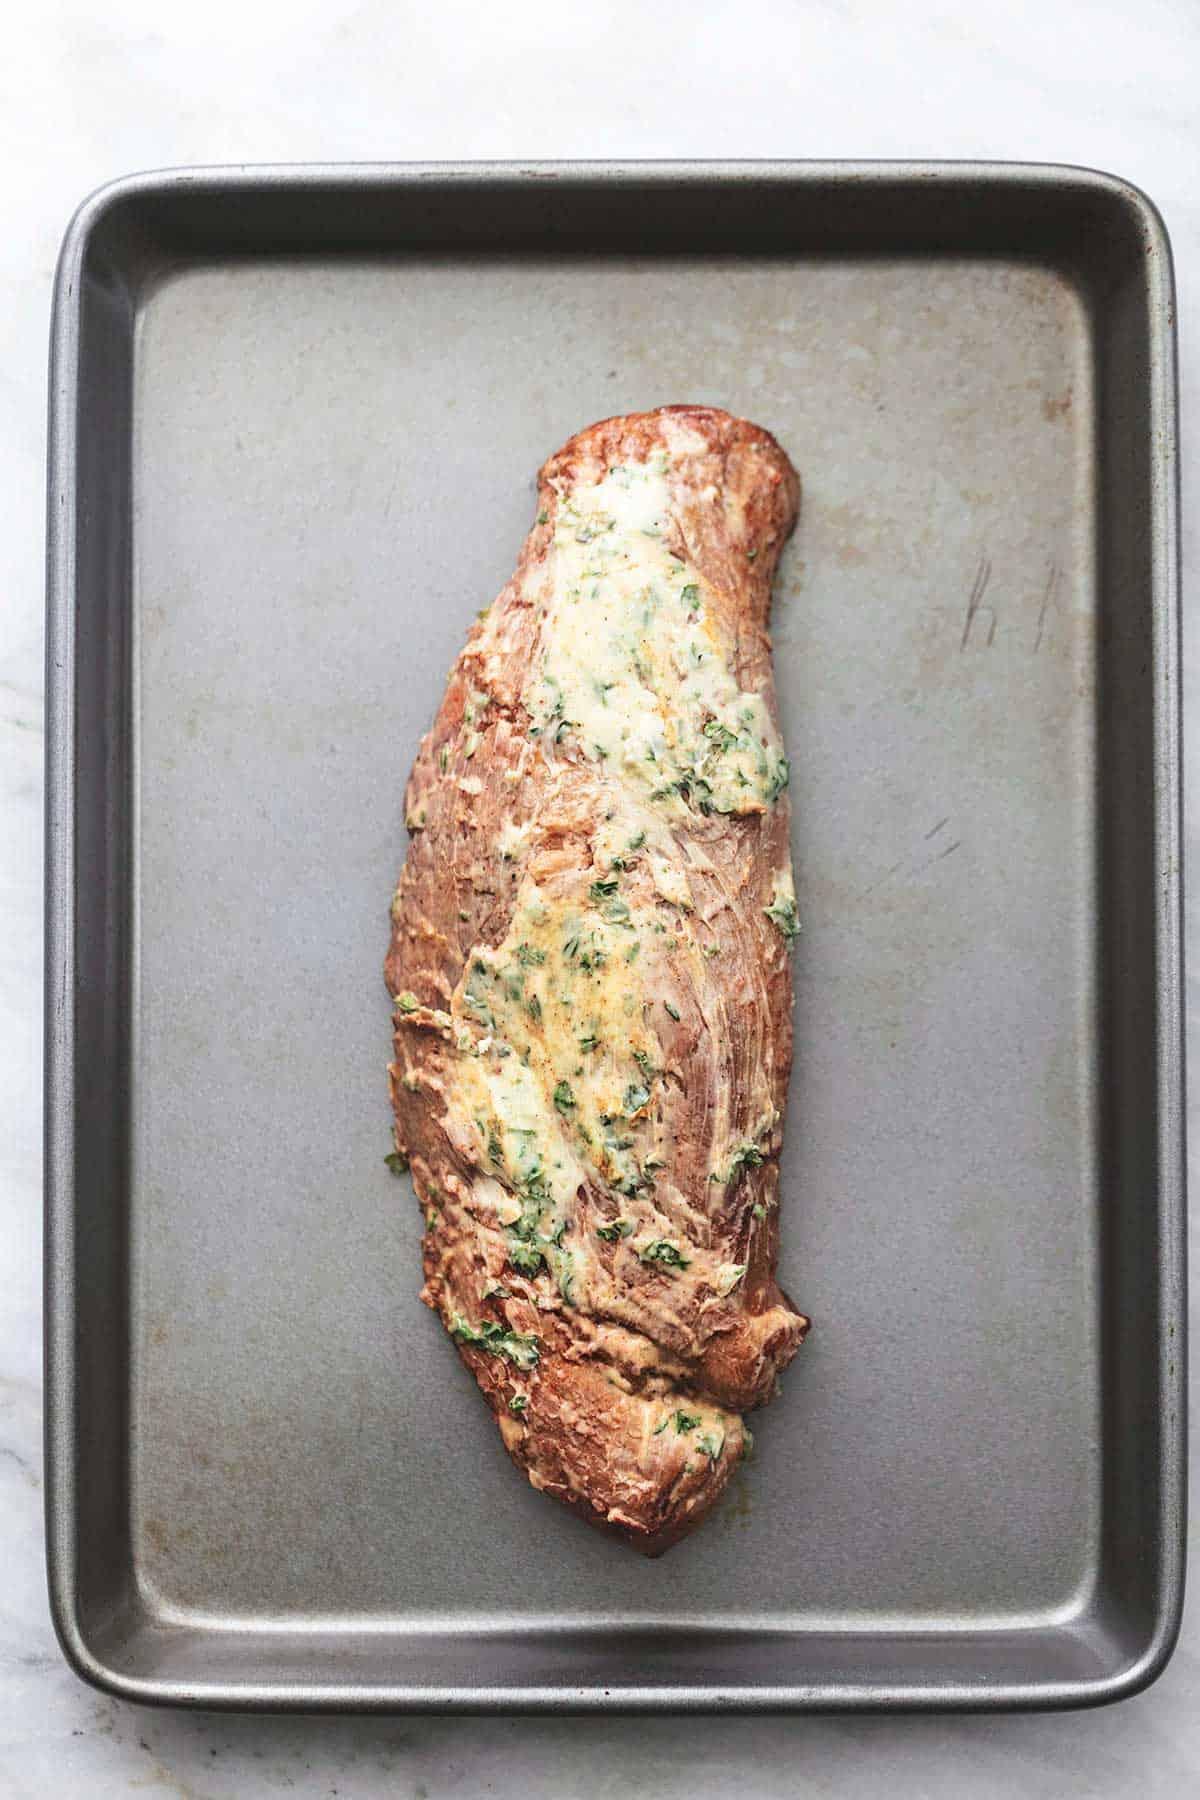 top view of garlic butter rubbed on uncooked garlic butter roasted pork tenderloin on a baking sheet.